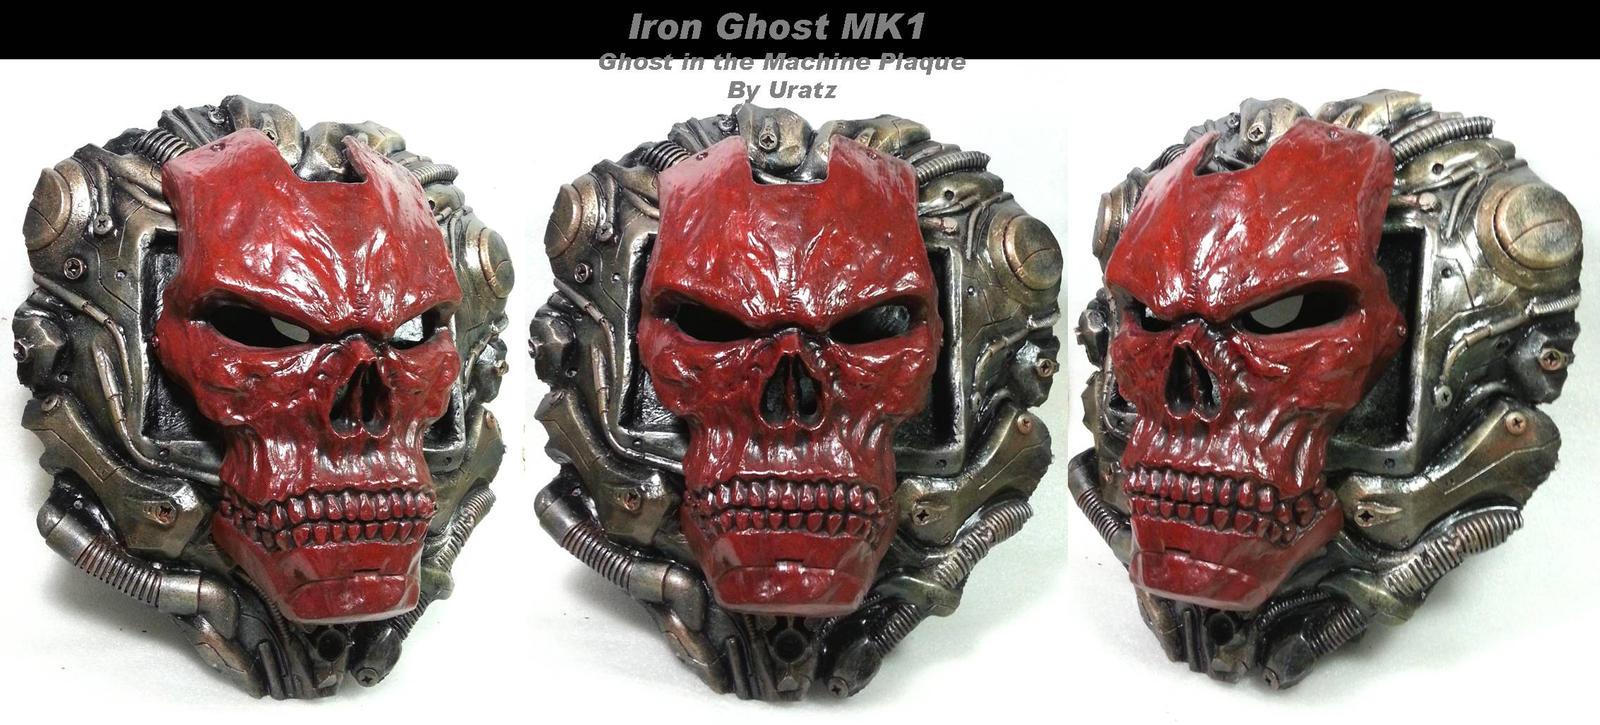 Iron ghost rider project by uratz studios on deviantart - Uratz studios ...